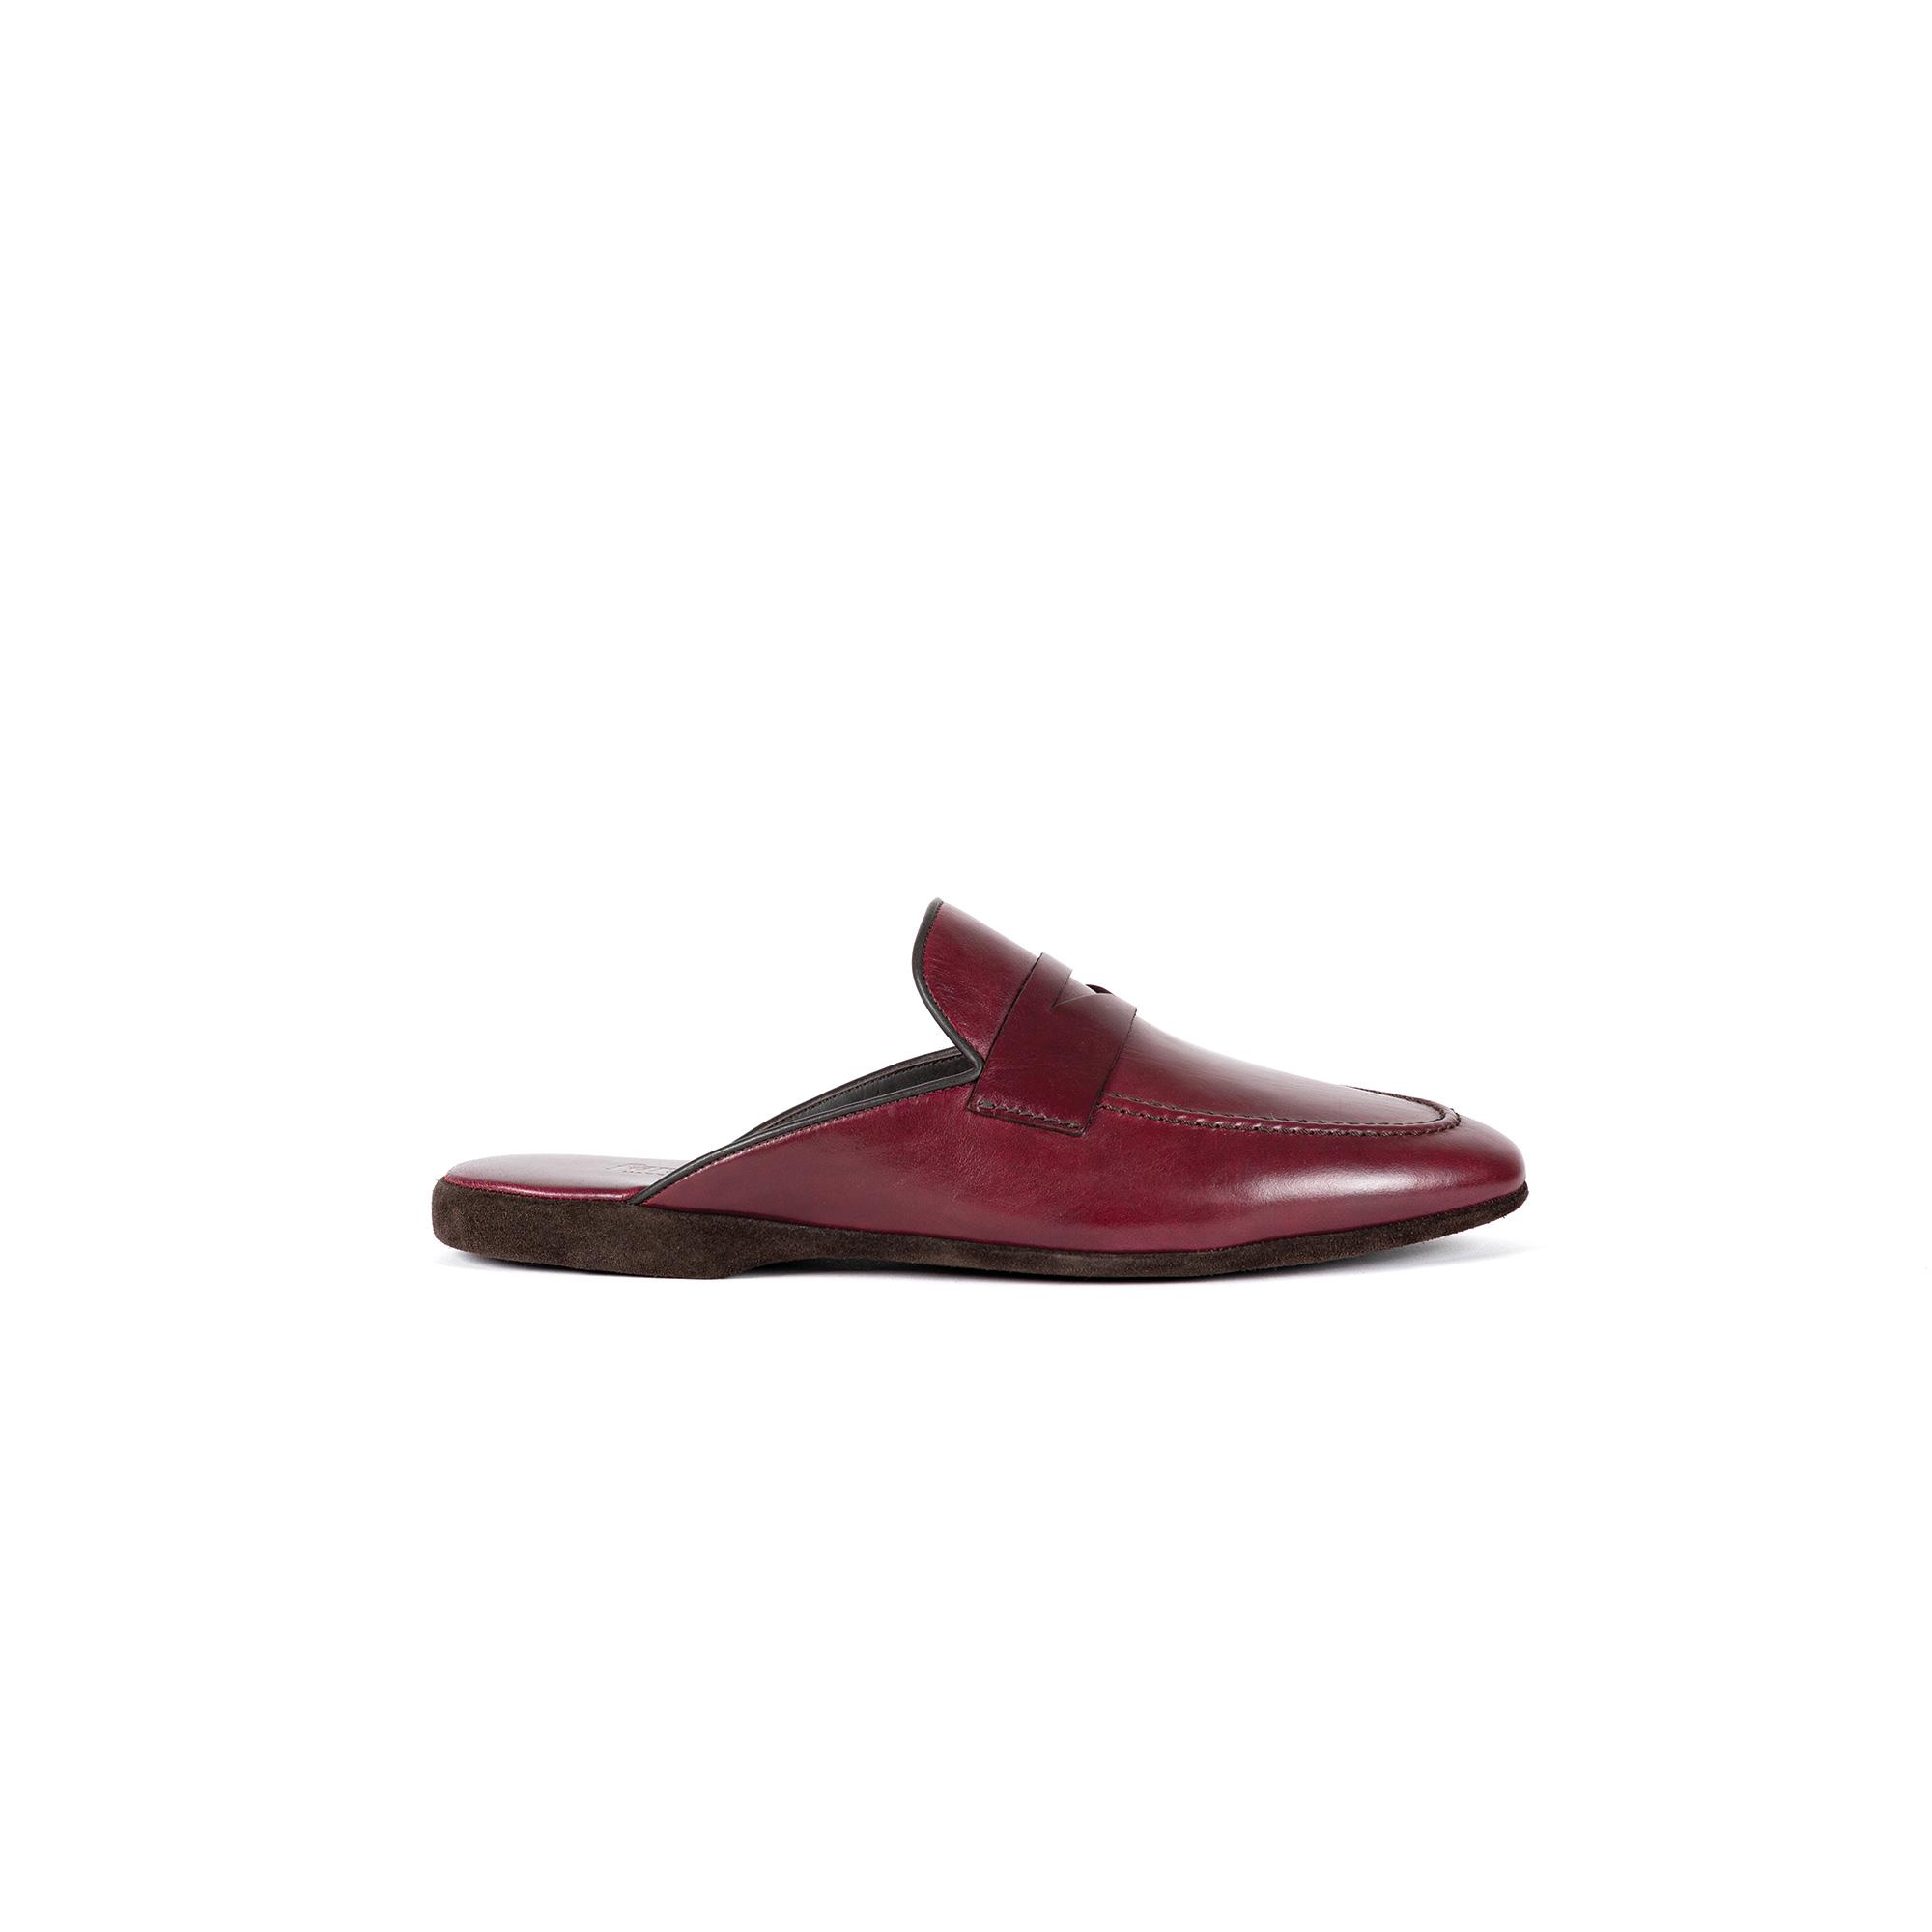 Indoor classic slipper in bordeaux calf leather - Farfalla italian slippers